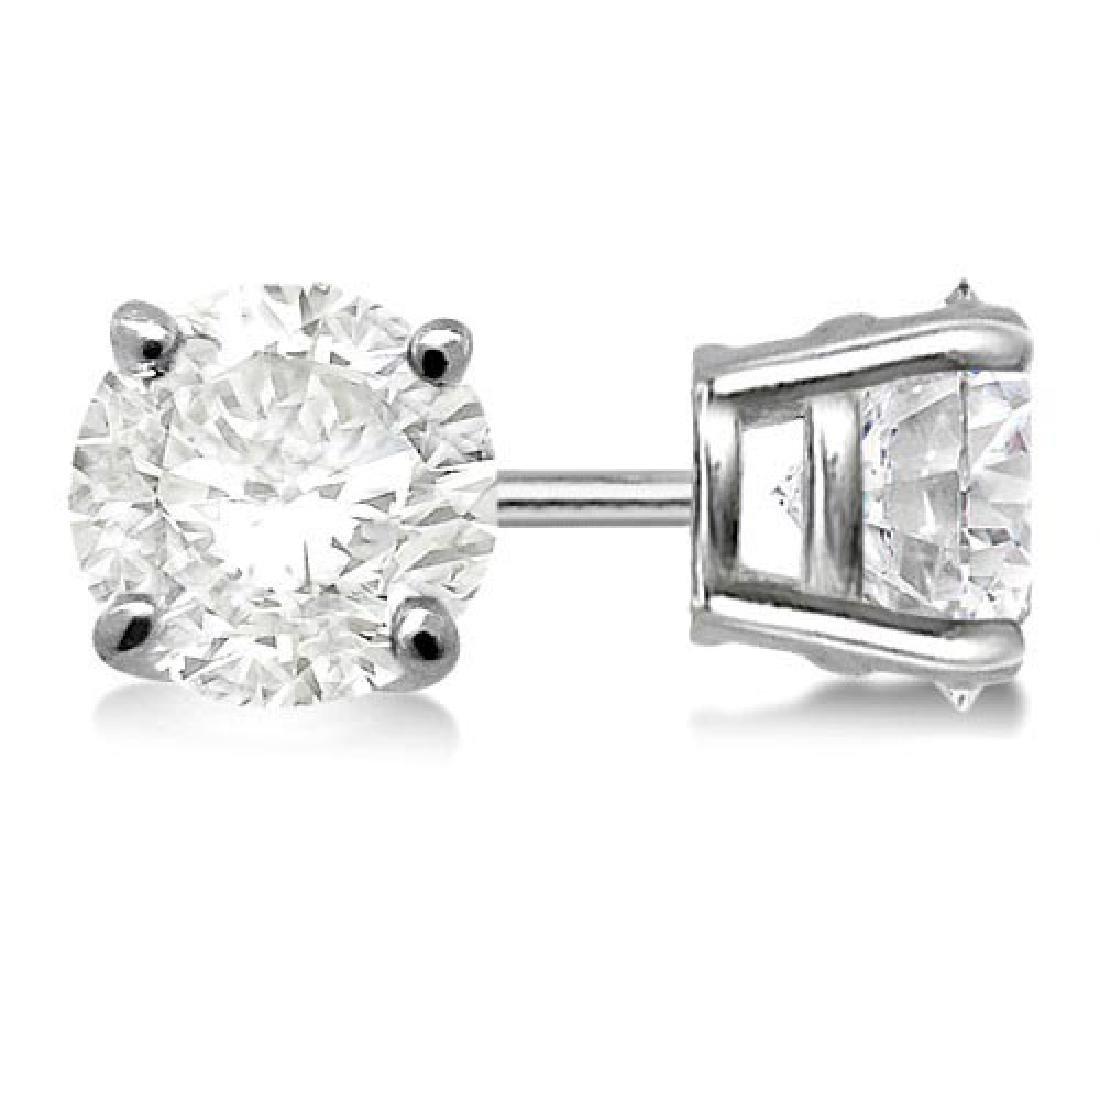 Certified 1.03 CTW Round Diamond Stud Earrings J/SI2